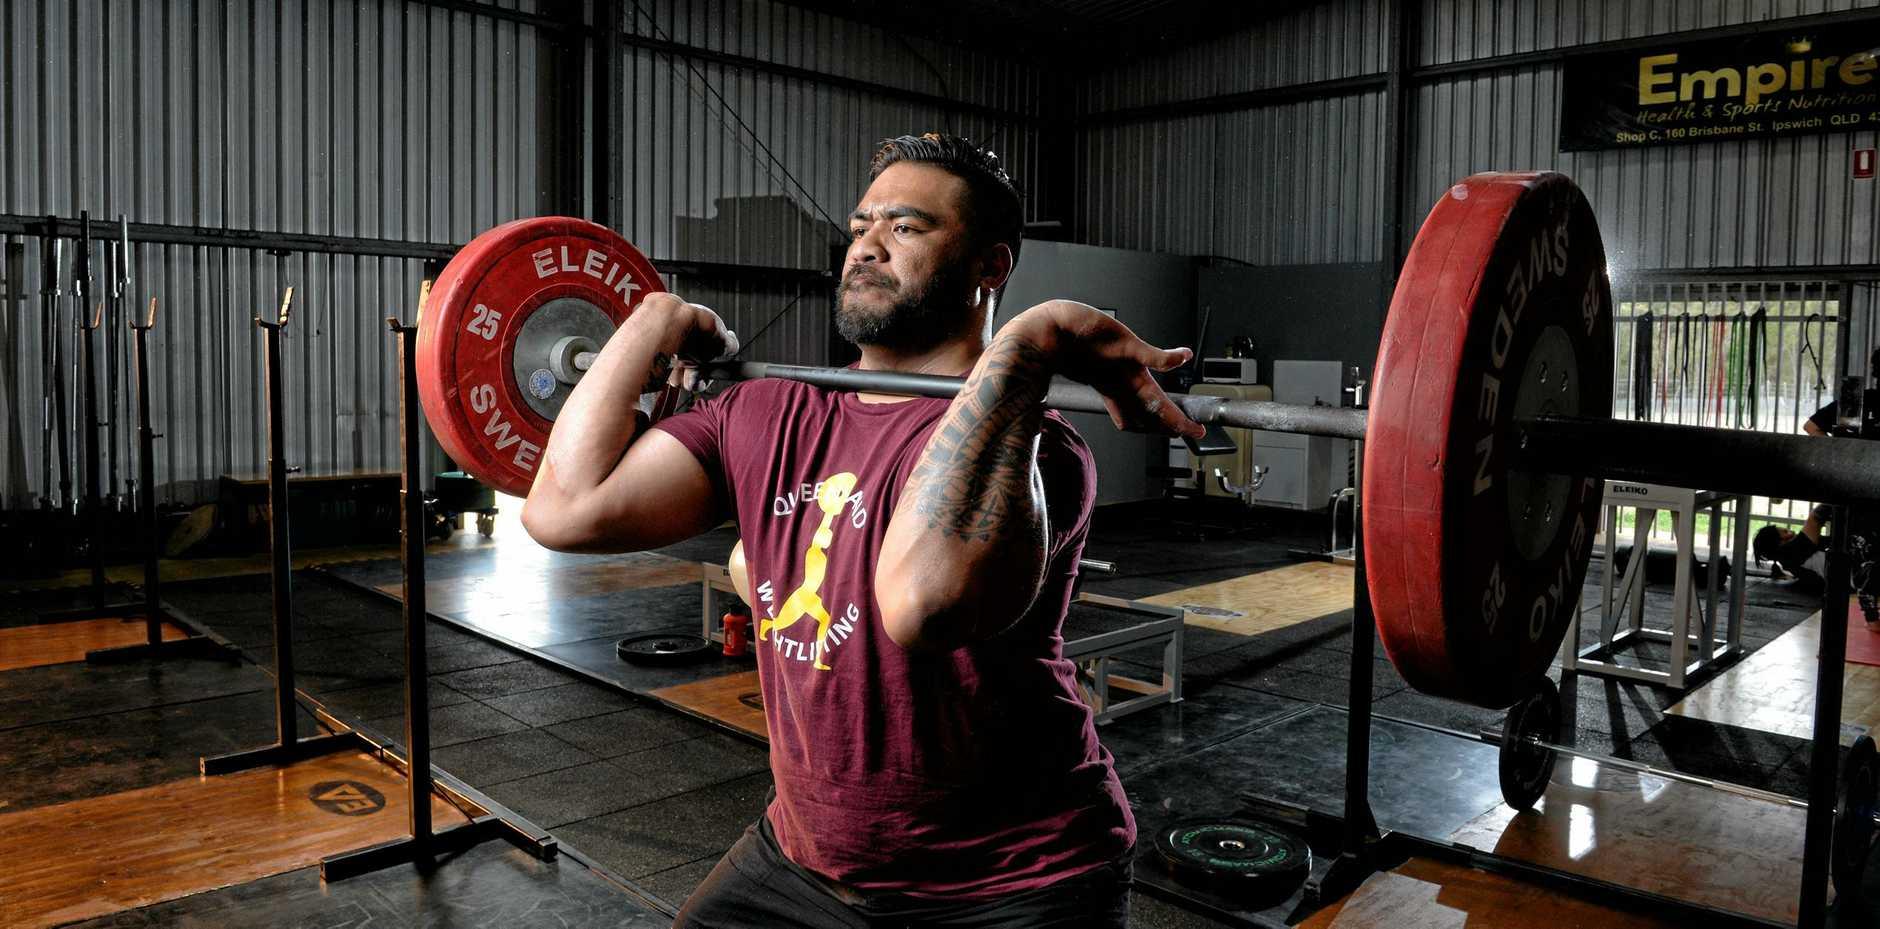 Jax Solofa  is the Australian Weightlifting Federation senior champion.